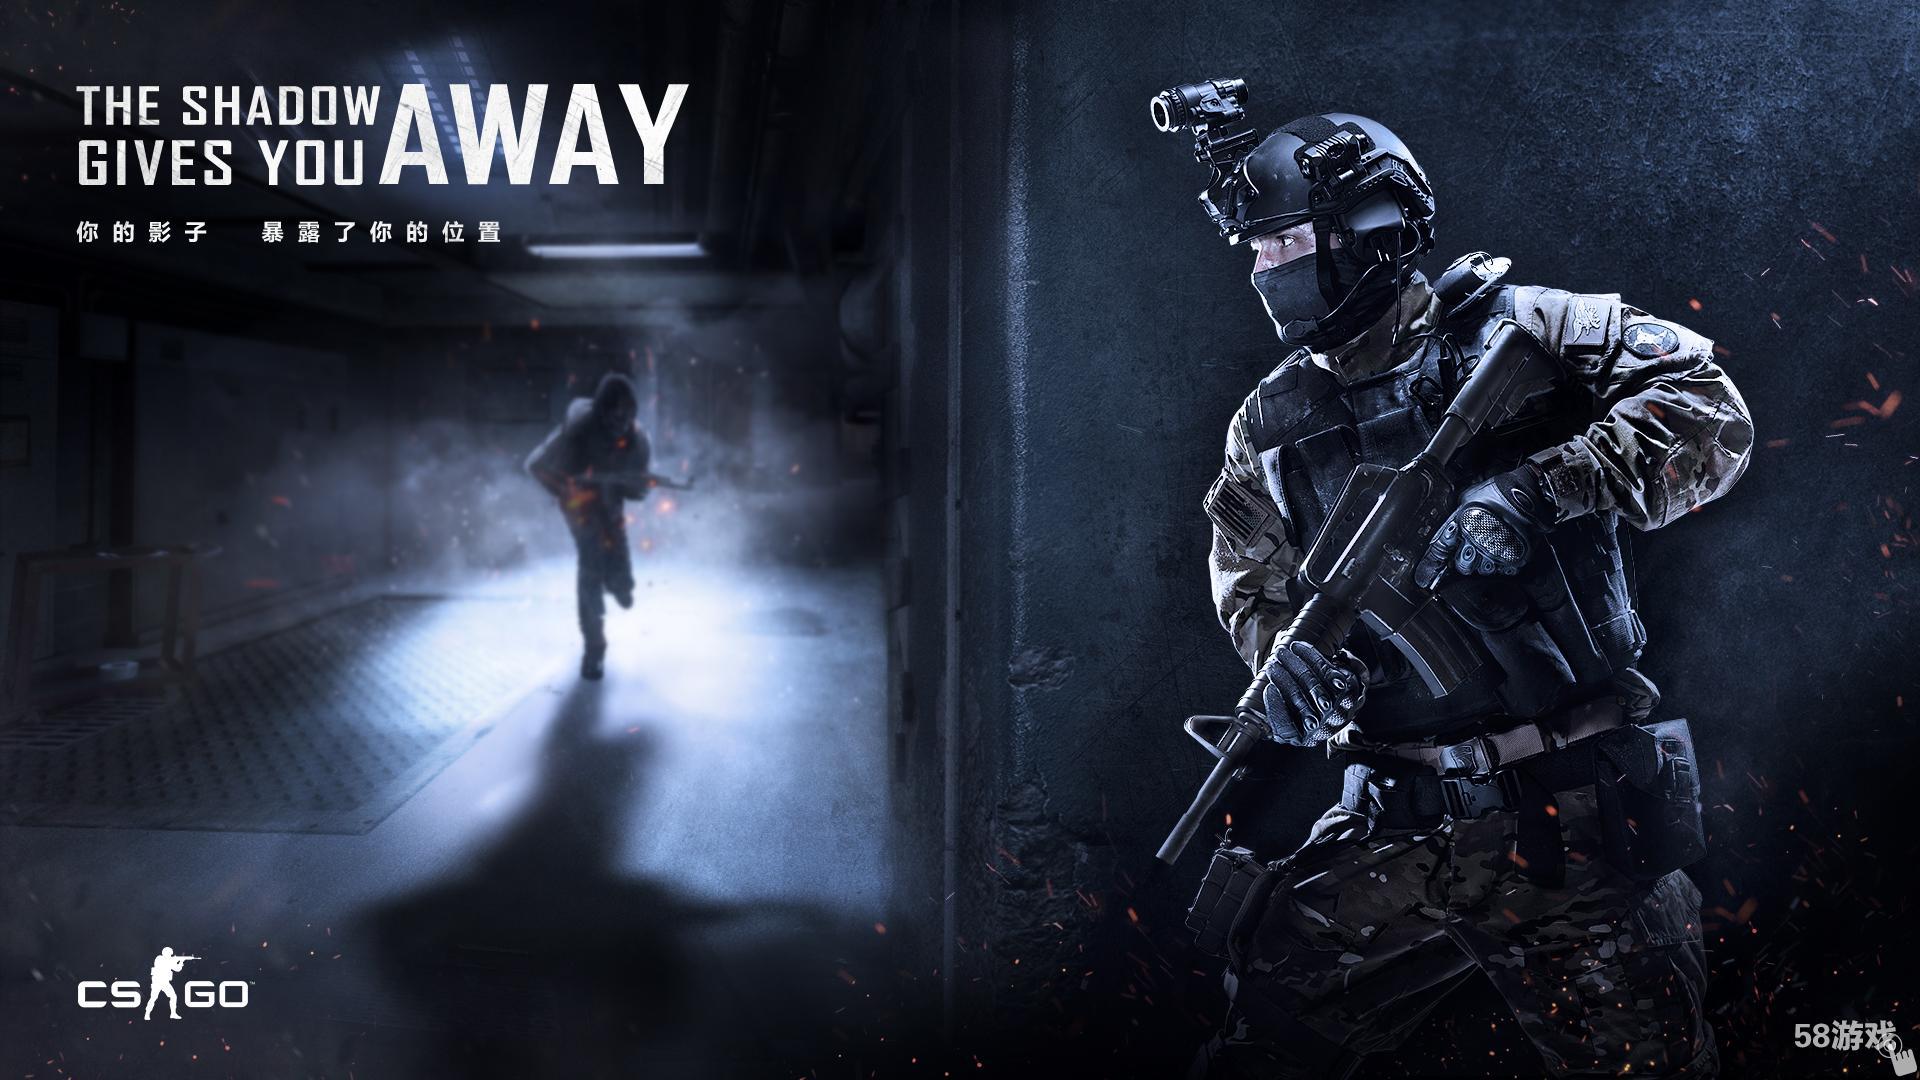 cs:go高清大图游戏海报